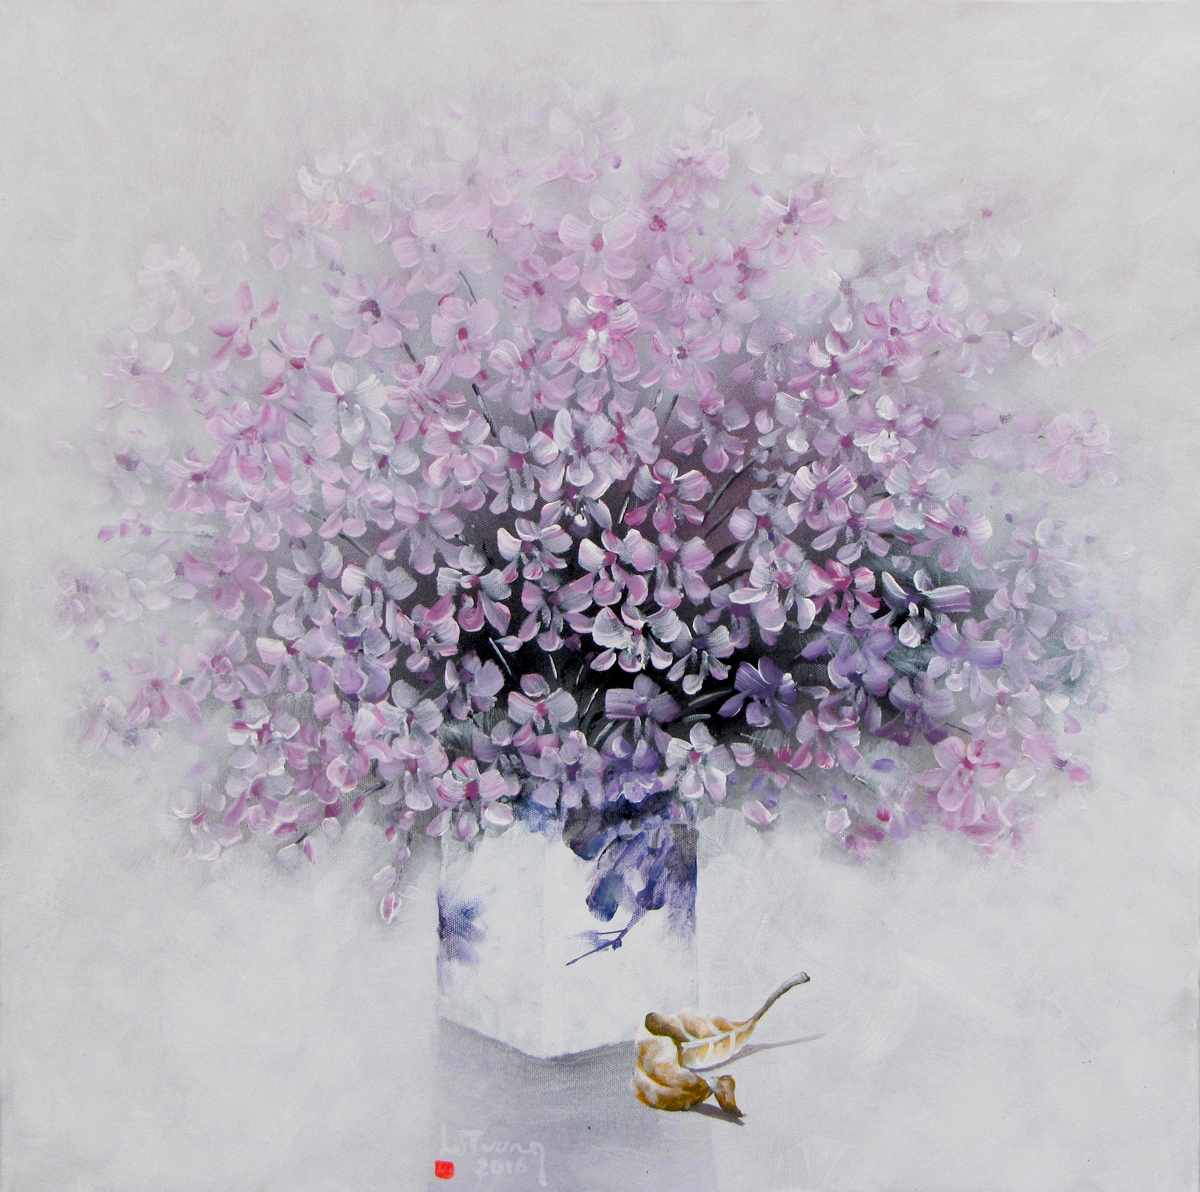 Vietnamese Art-Vase of Purple Flowers, an Oil Painting on Canvas